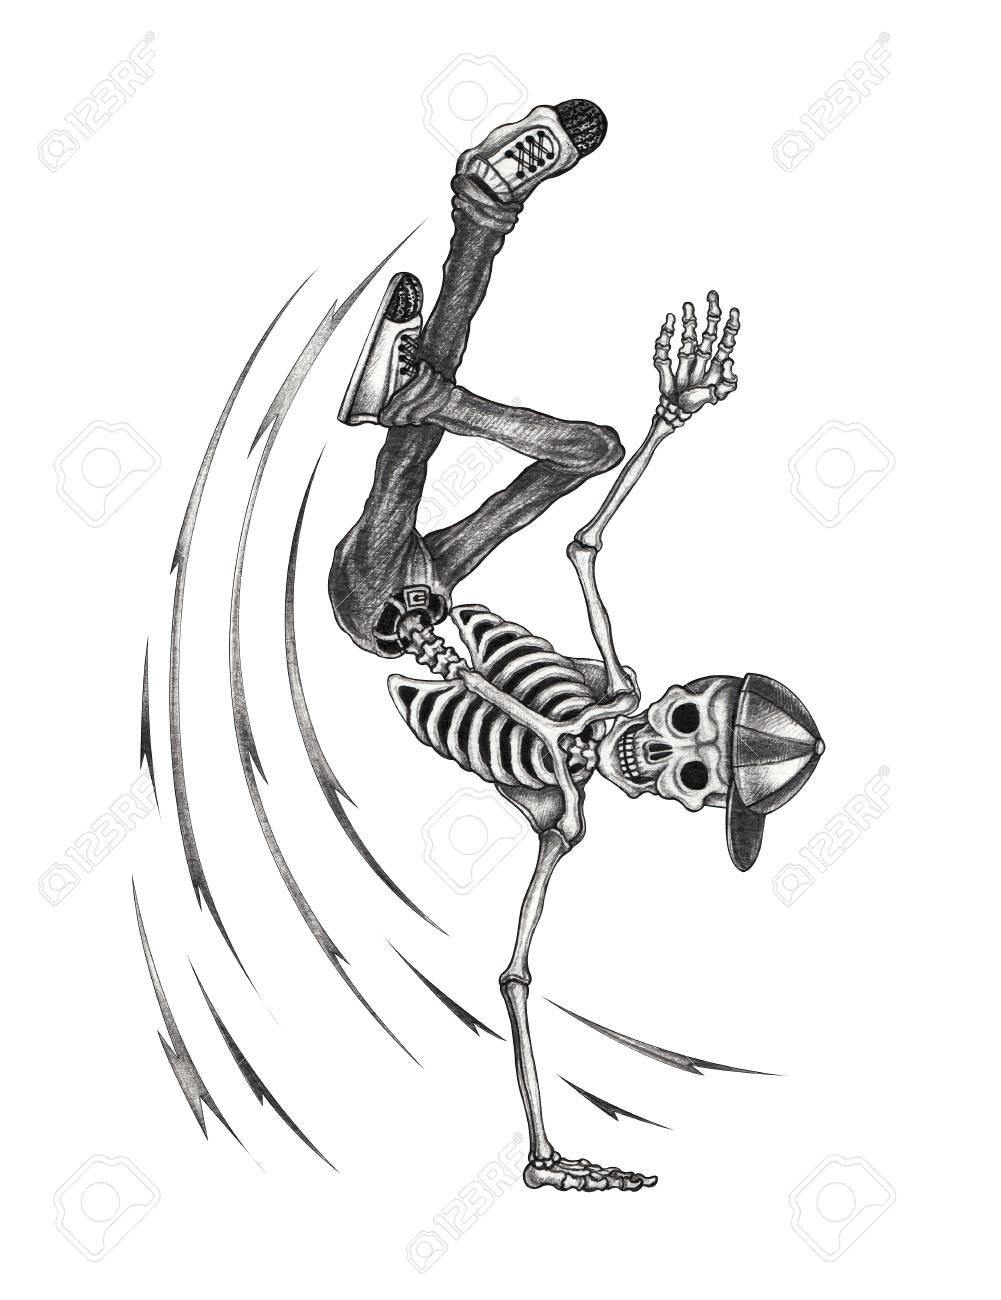 Art b boy dance skull hand pencil drawing on paper stock photo 94807990